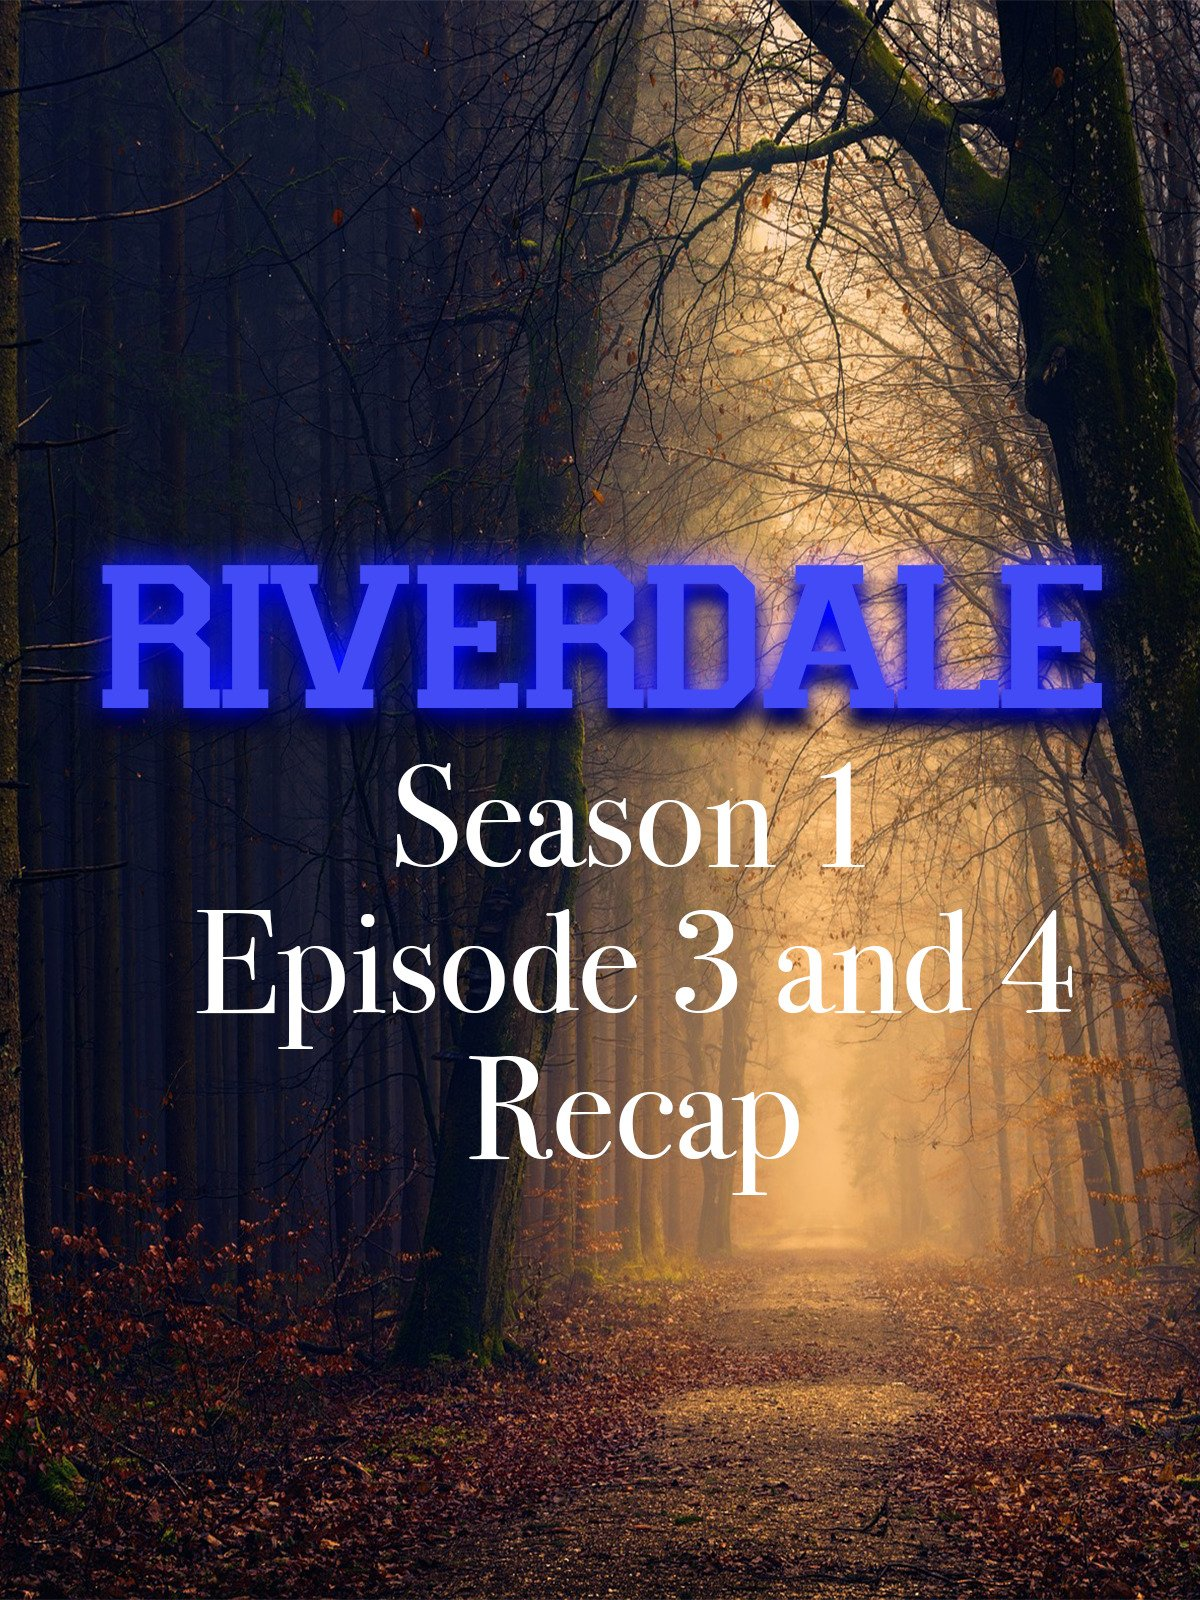 Amazon com: Watch Riverdale Season 1 Episode 3 and 4 Recap